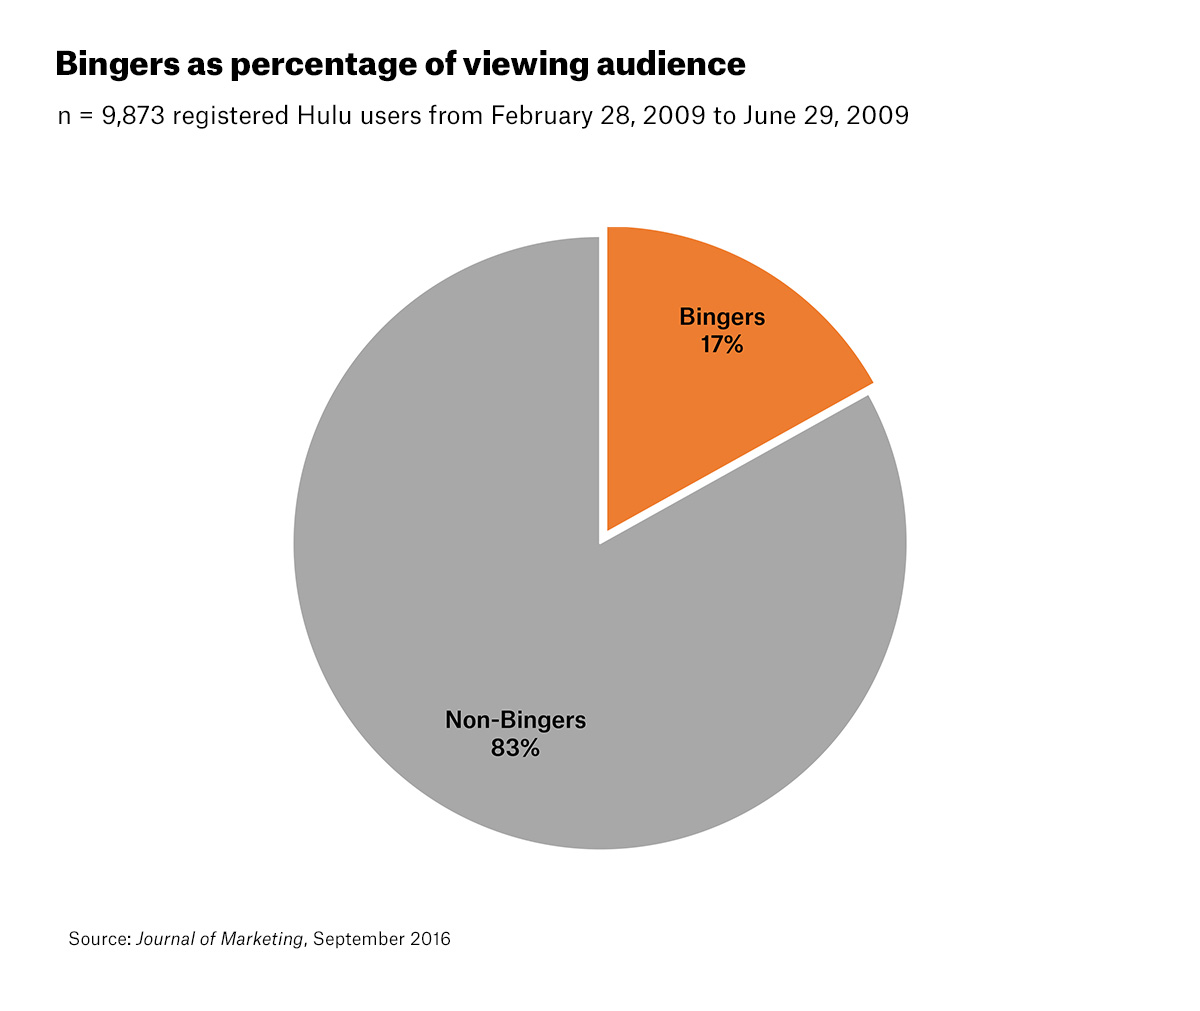 Bingers percentage